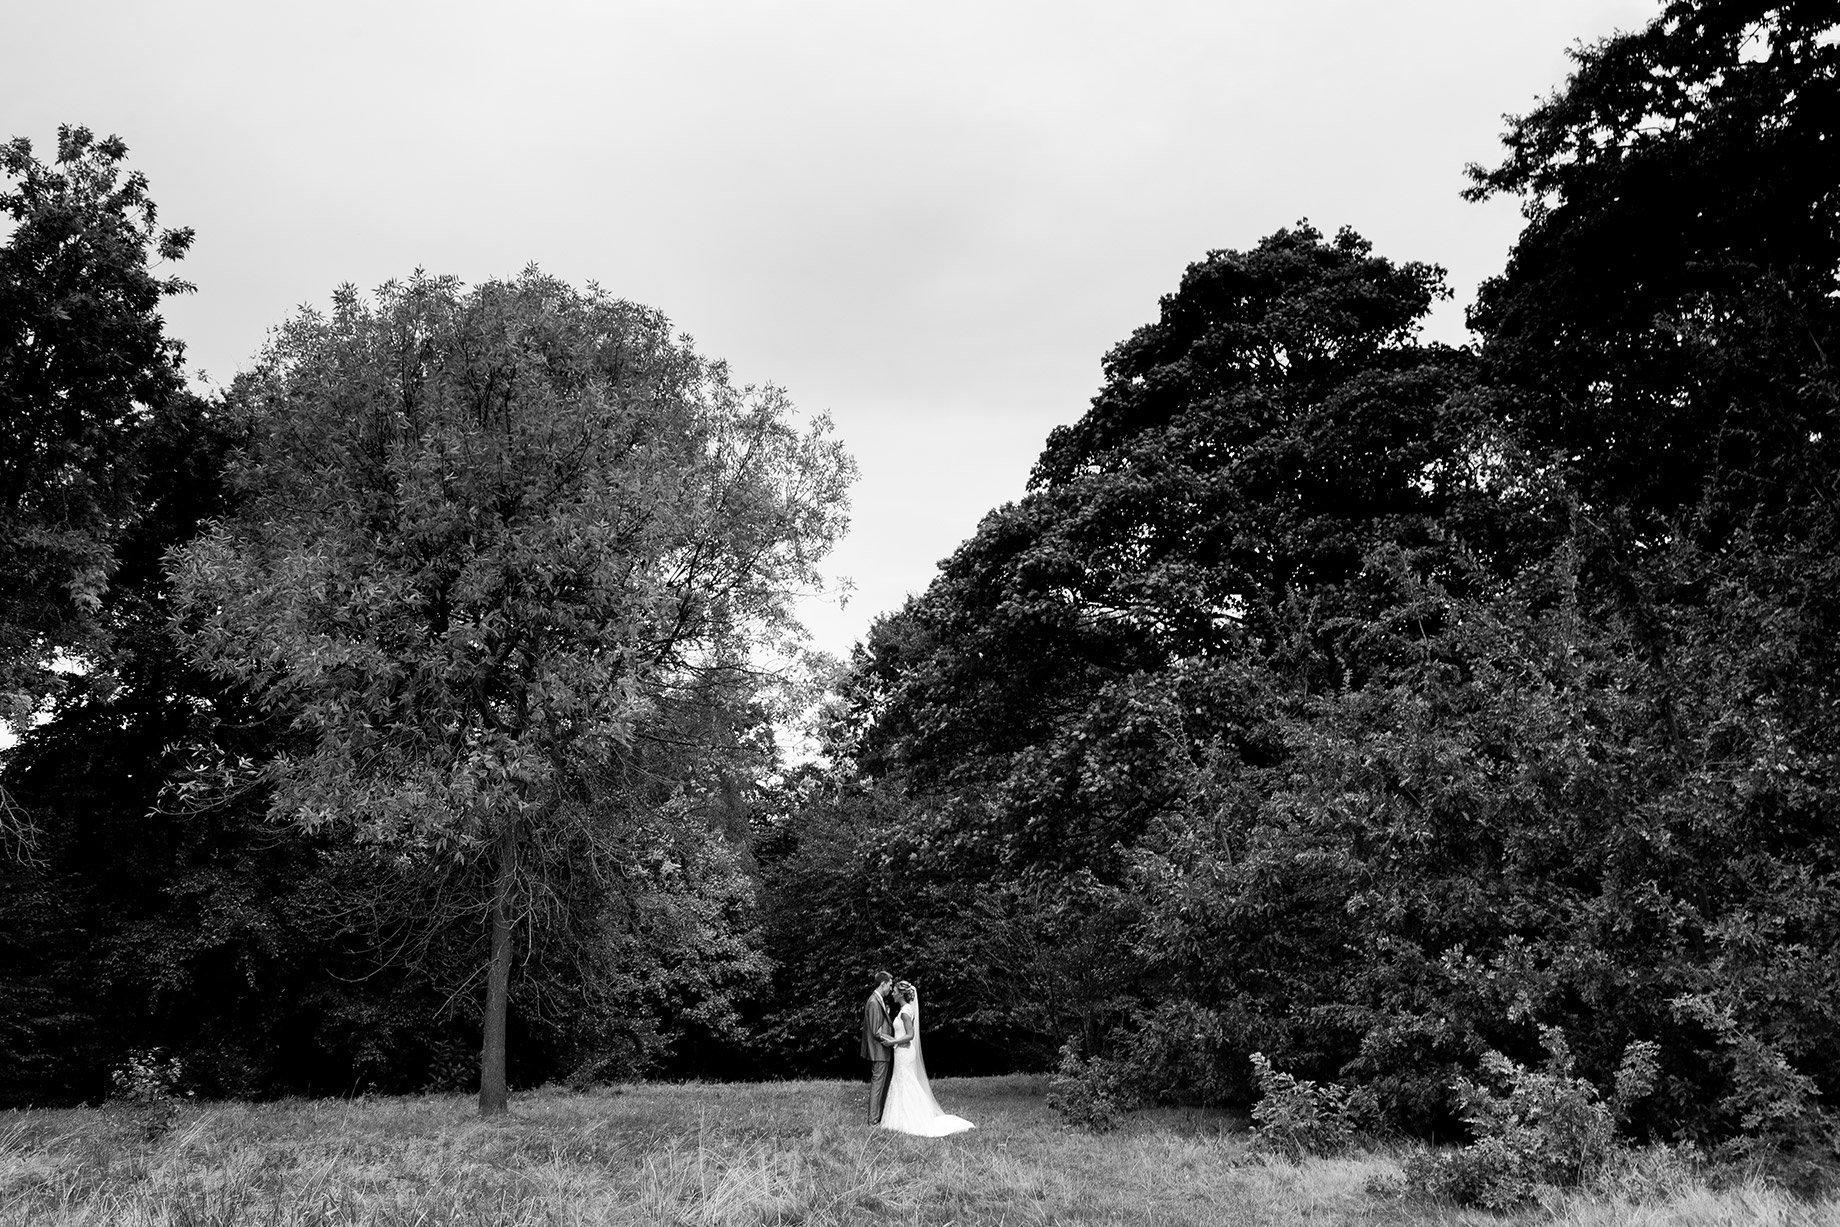 Wedding photographer Preston